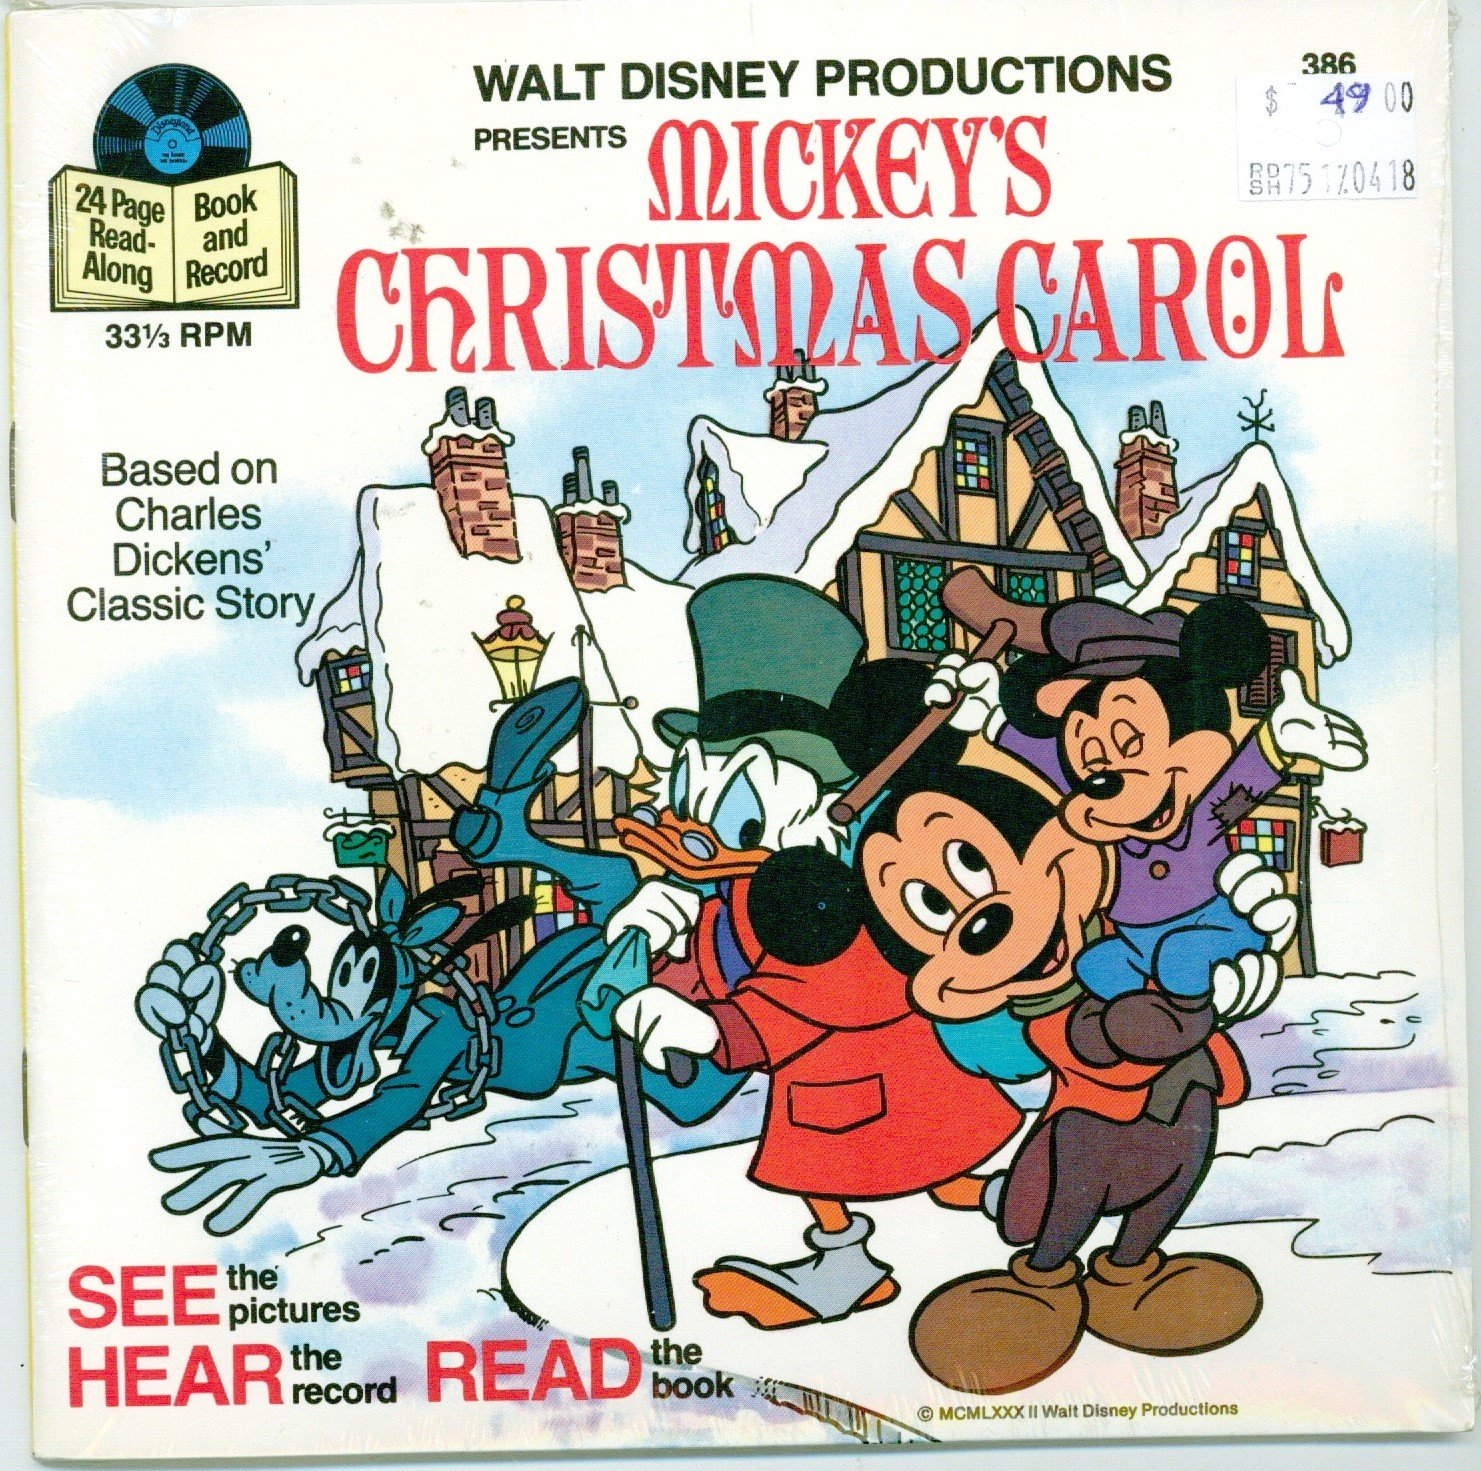 Mickeys Christmas Carol Book.Mickey S Christmas Carol Book And 33 1 3 Rpm Record See